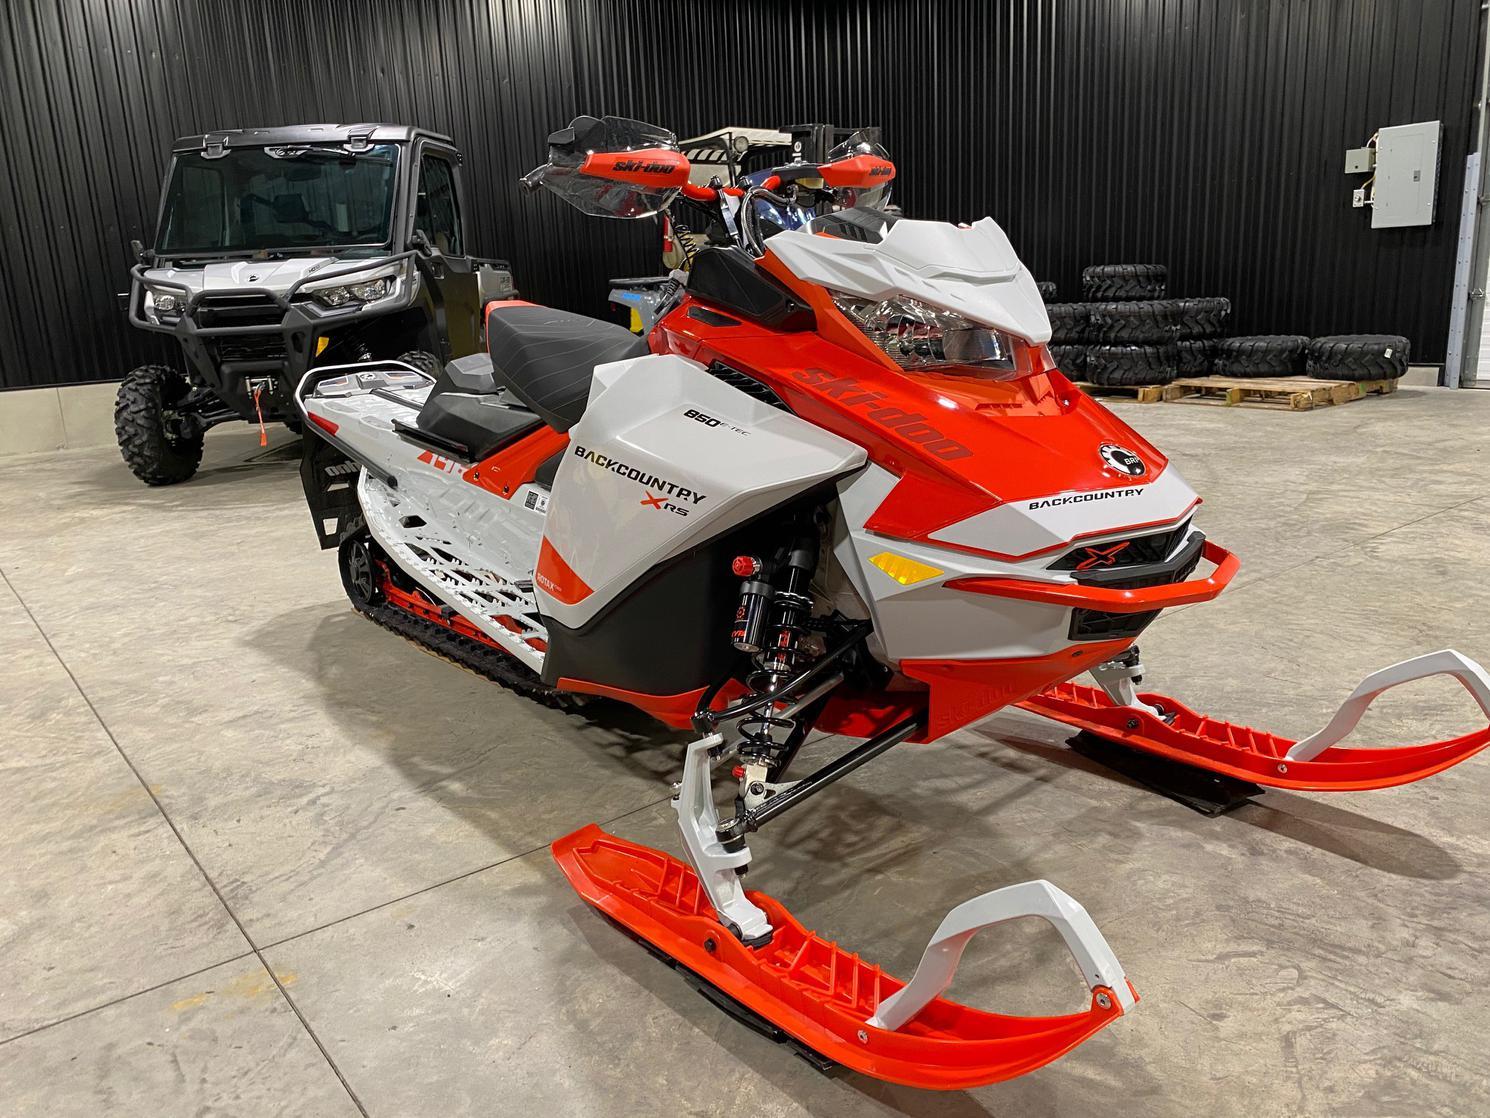 Ski-Doo BACKCOUNTRY XR-S - 850cc 146X1.6 ICE RIPPER 2021